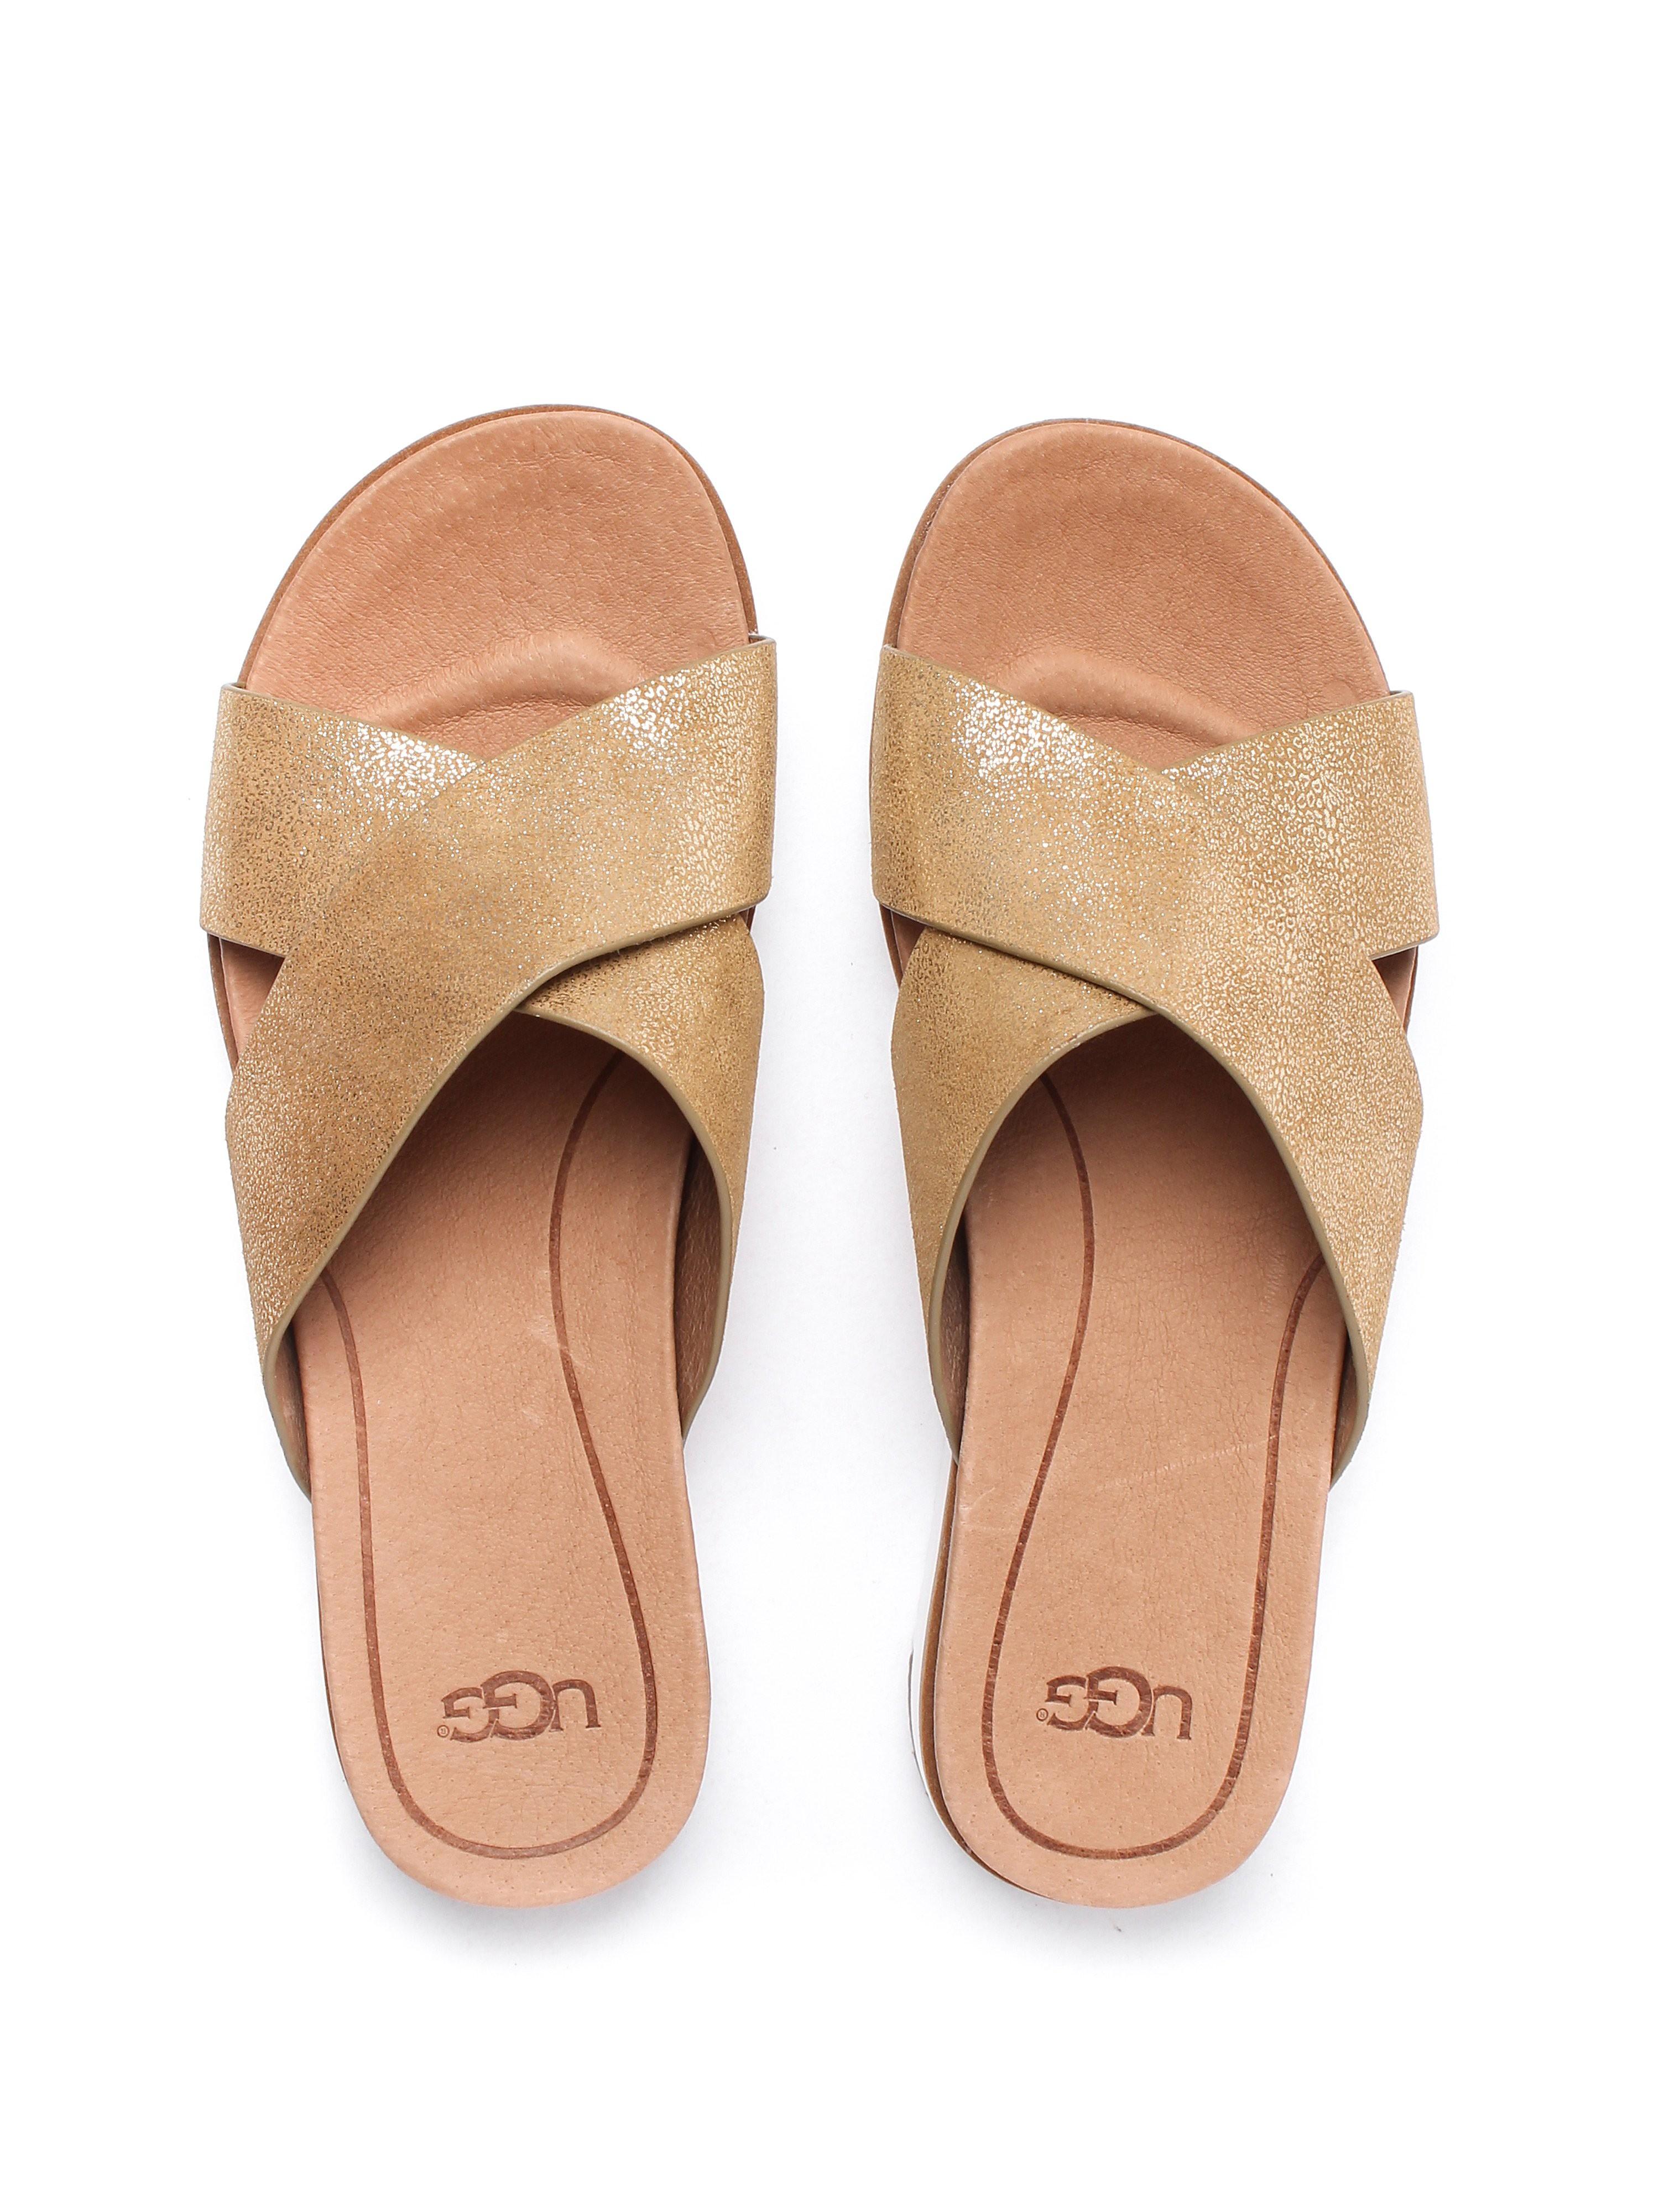 Ugg Women's Kari Metallic Suede Slide Sandals - Gold